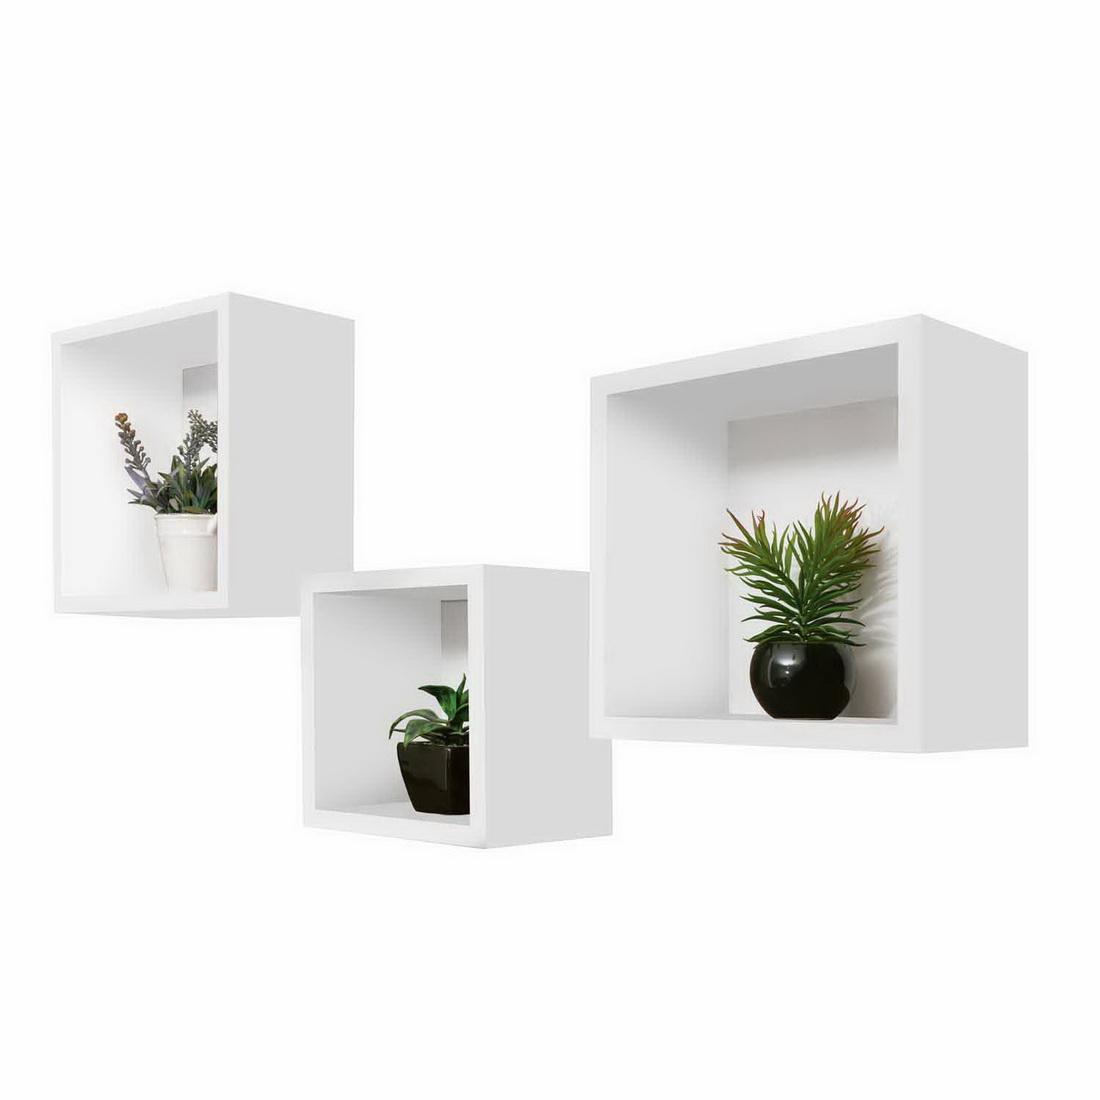 3 in 1 Cubeline Set Floating Shelves White